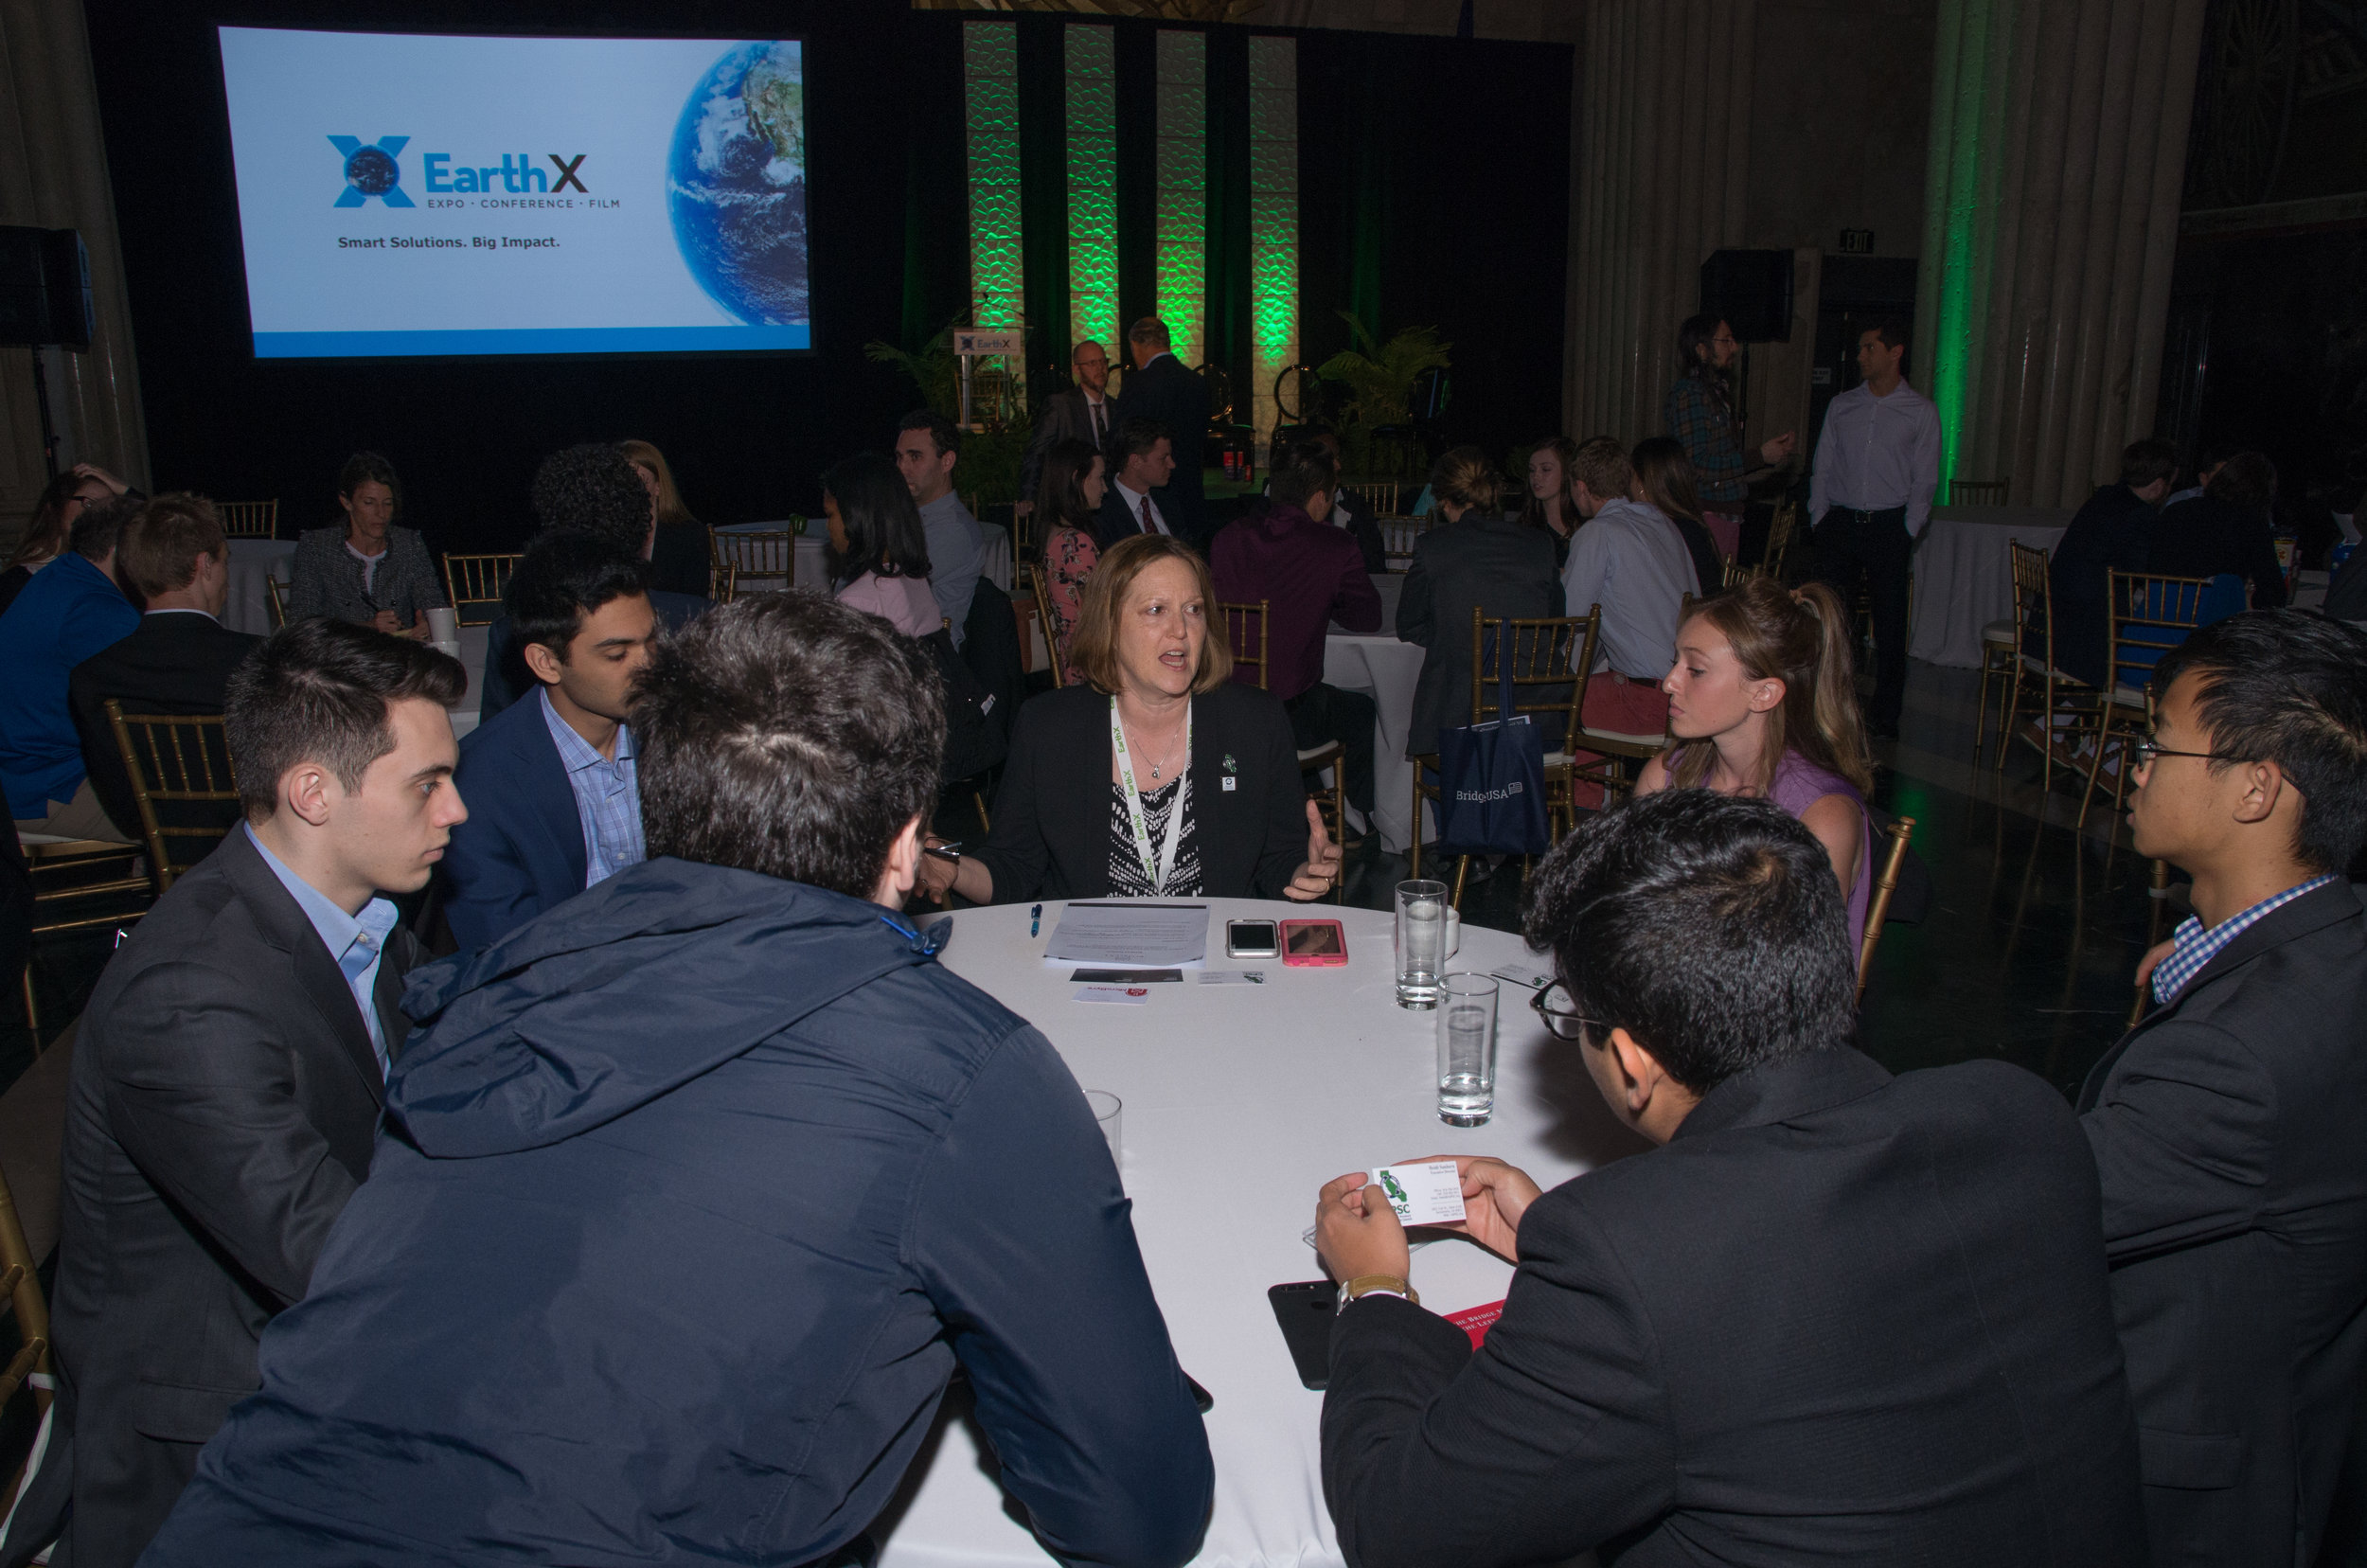 2018-04-21 - EarthX Bridge Summit Conference (SD) 064.jpg